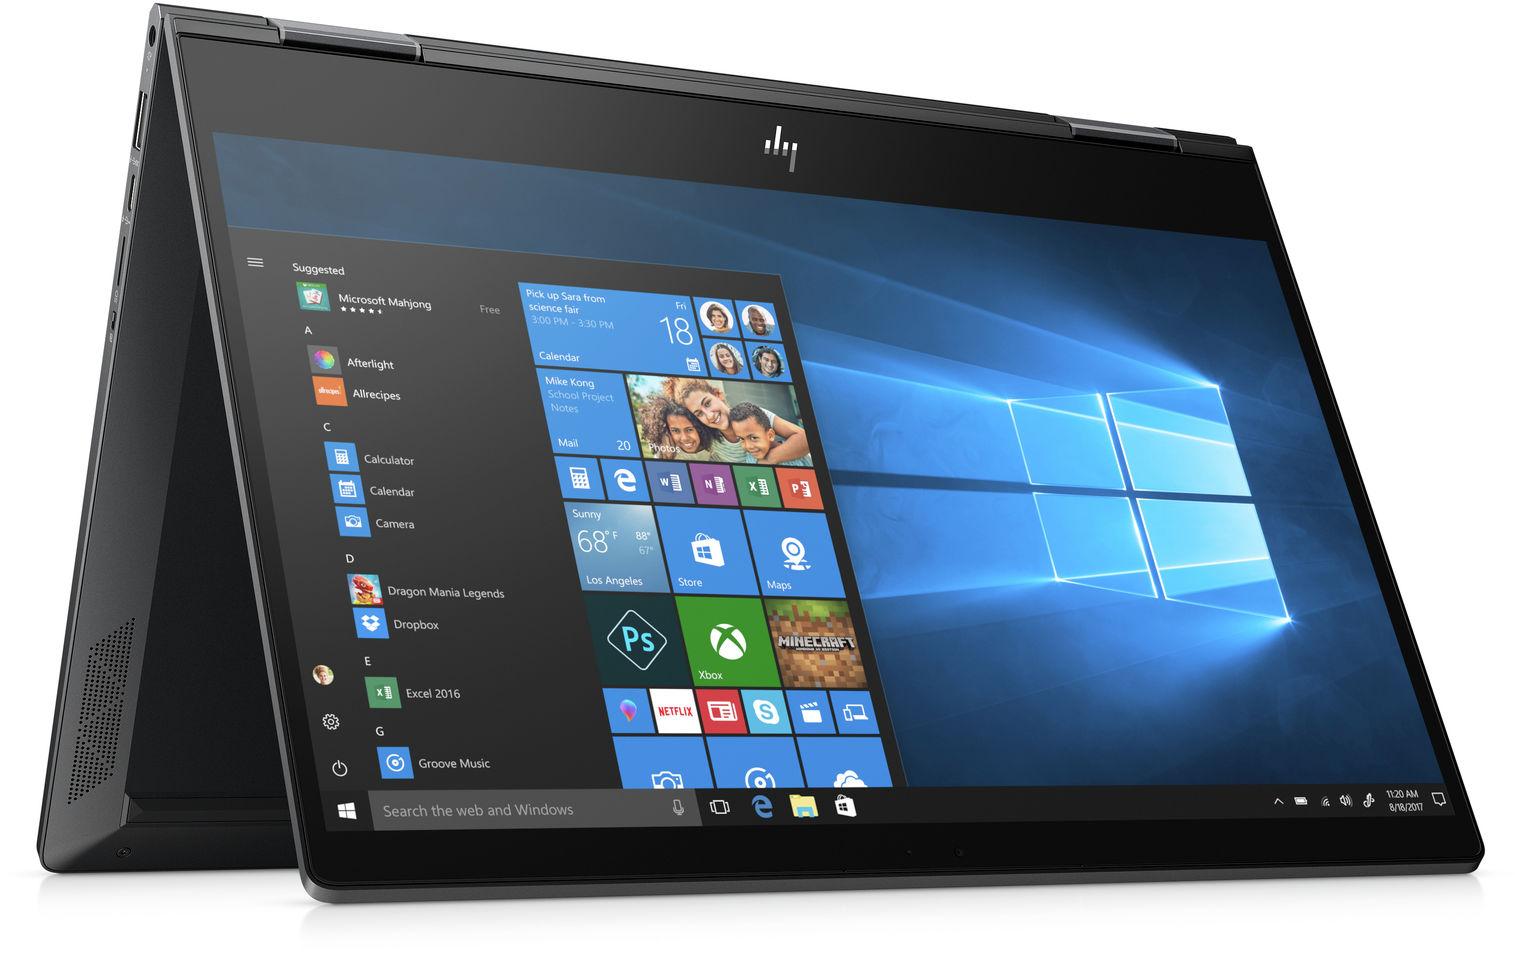 Laptop HP ENVY x360 13-ar0021nw 155G6EA